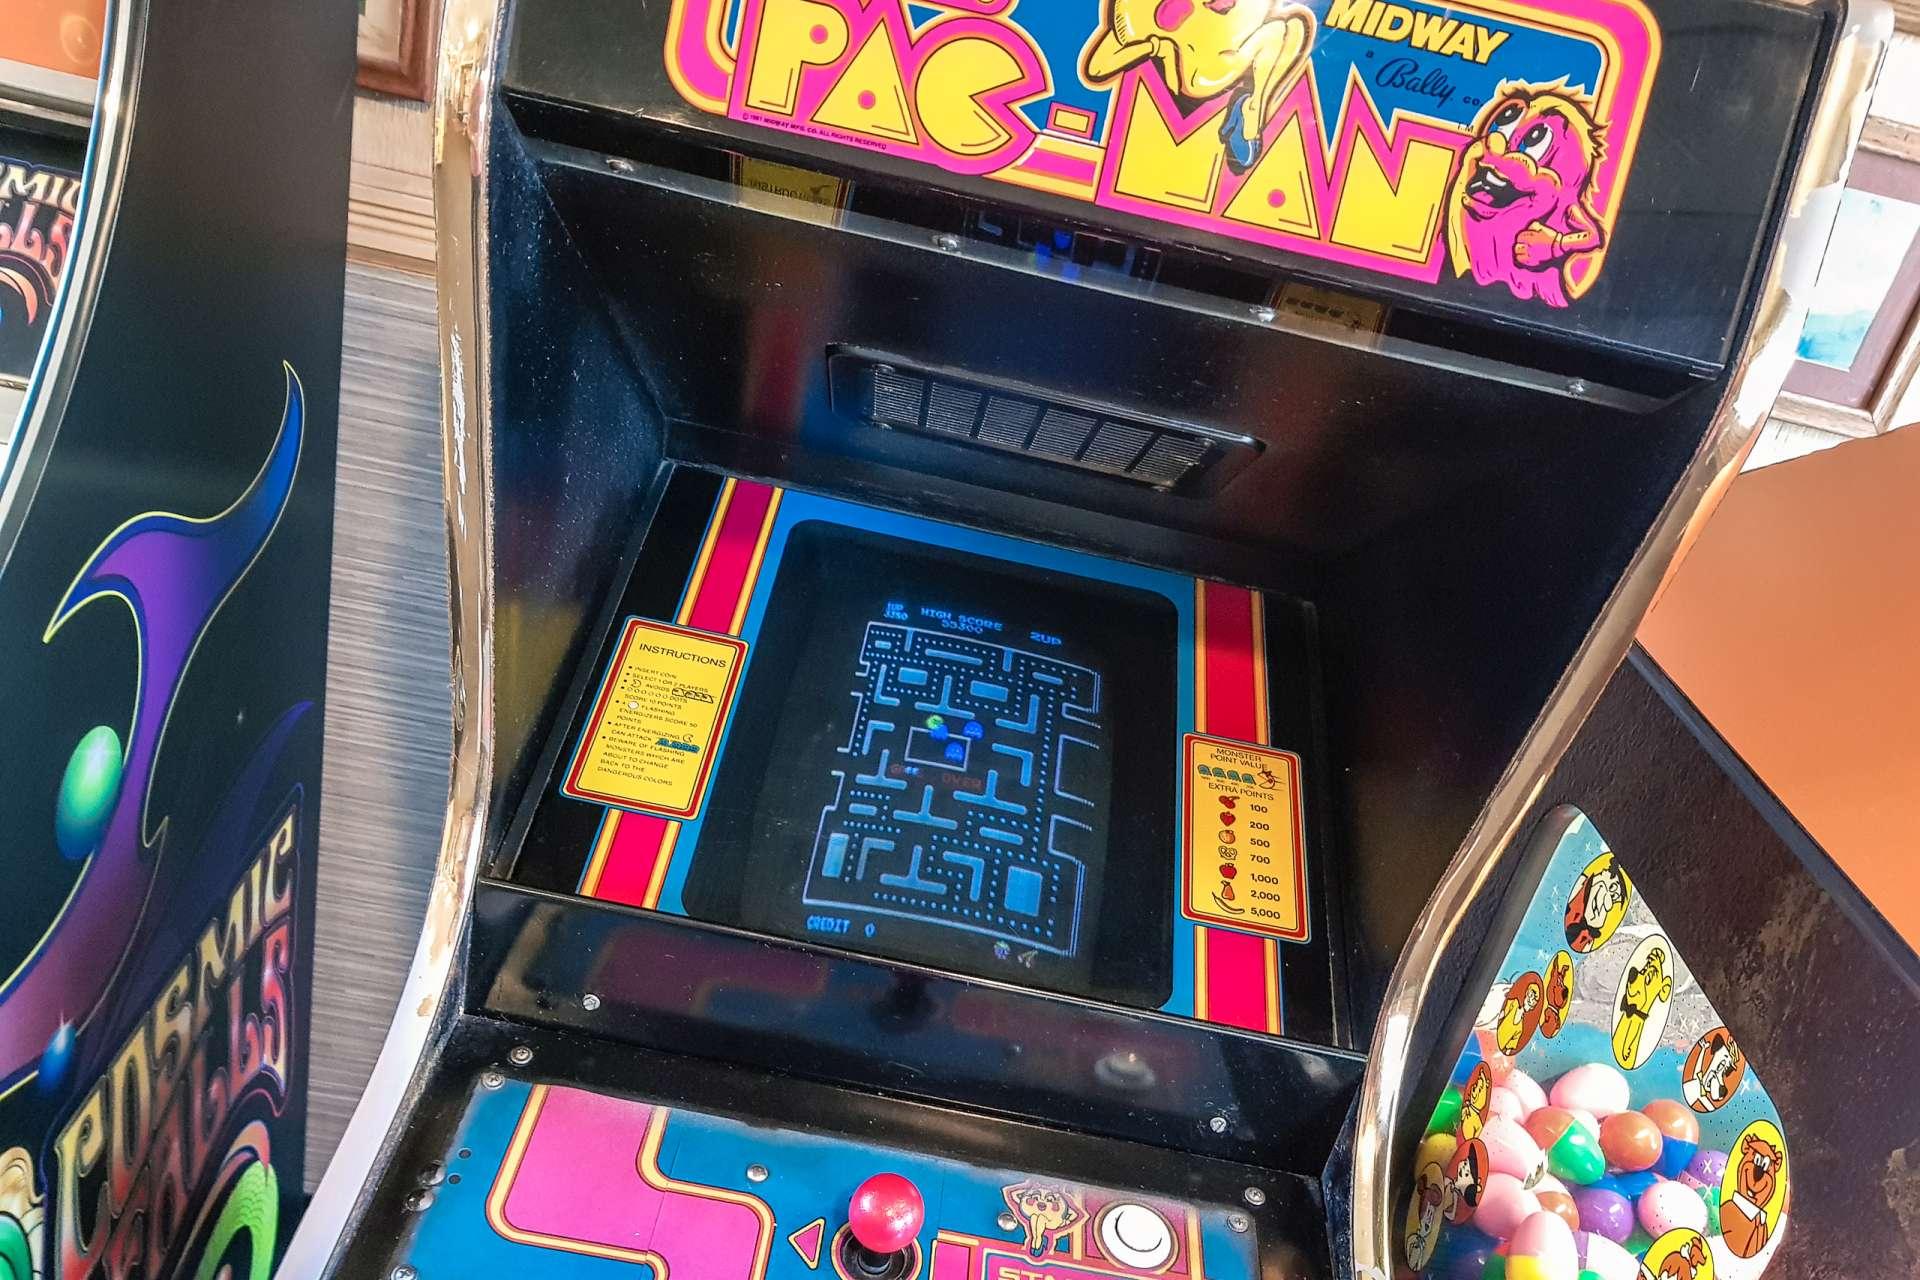 USA Pacman